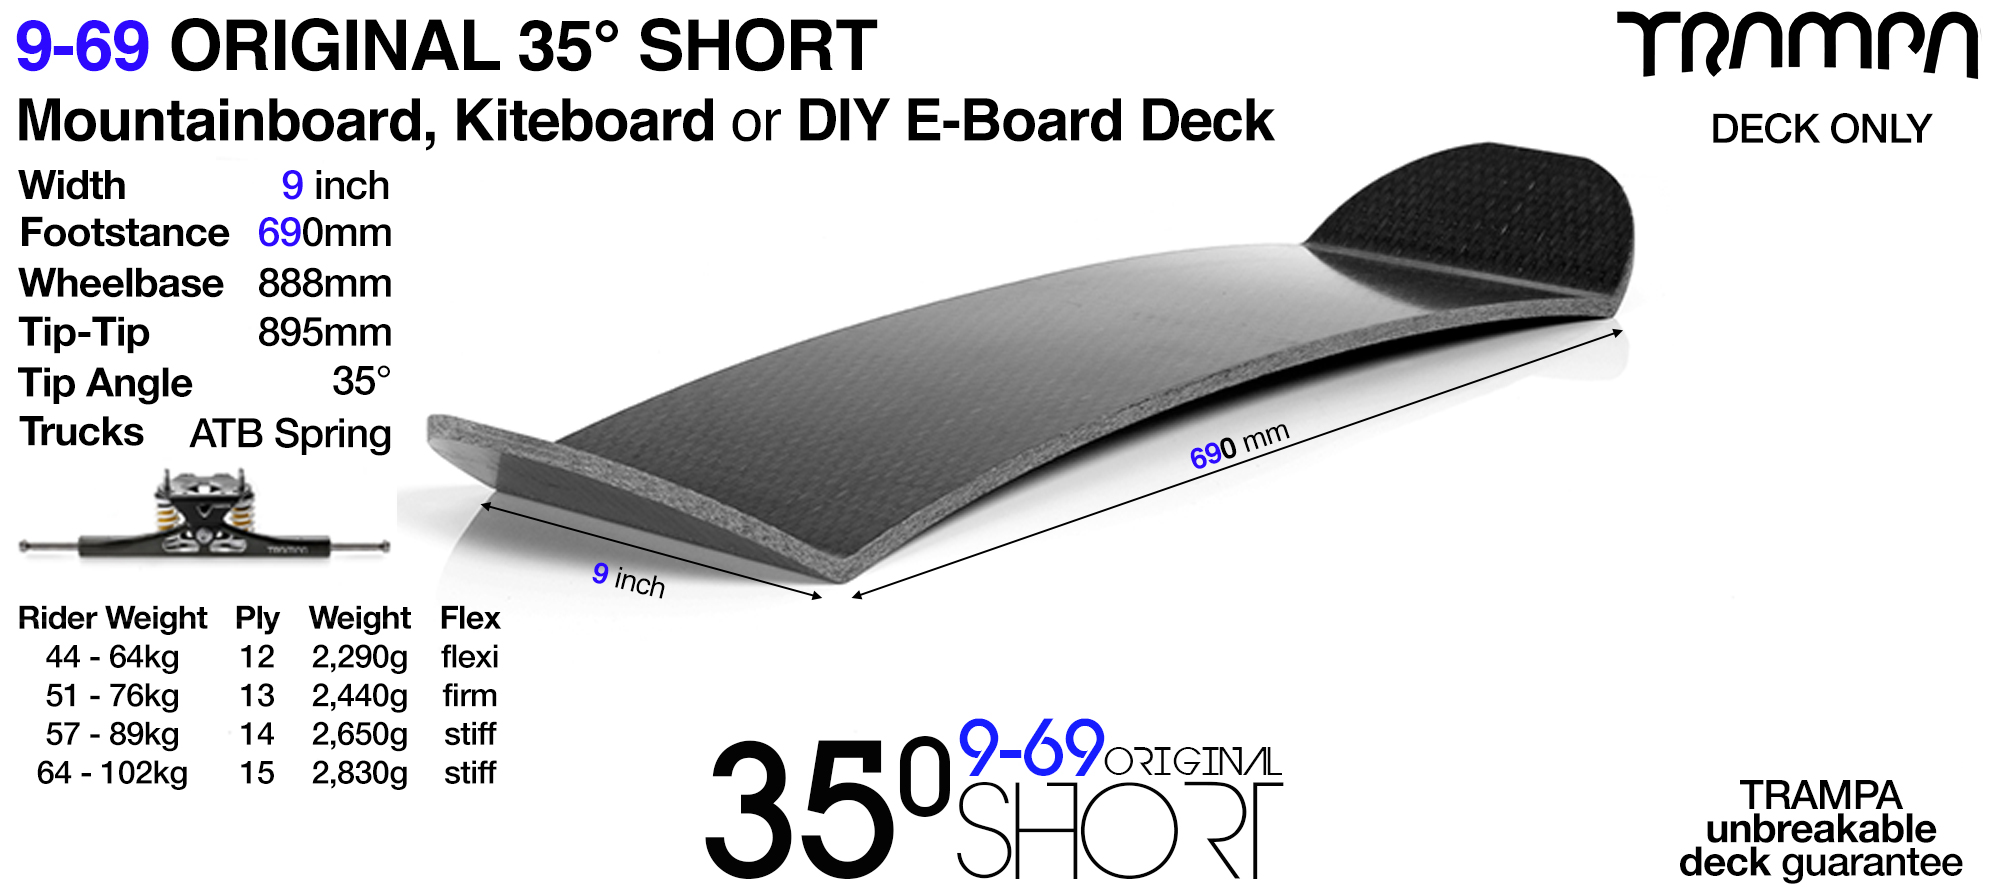 35° SHORT Original 9-69 TRAMPA Mountainboard or Kiteboard Deck